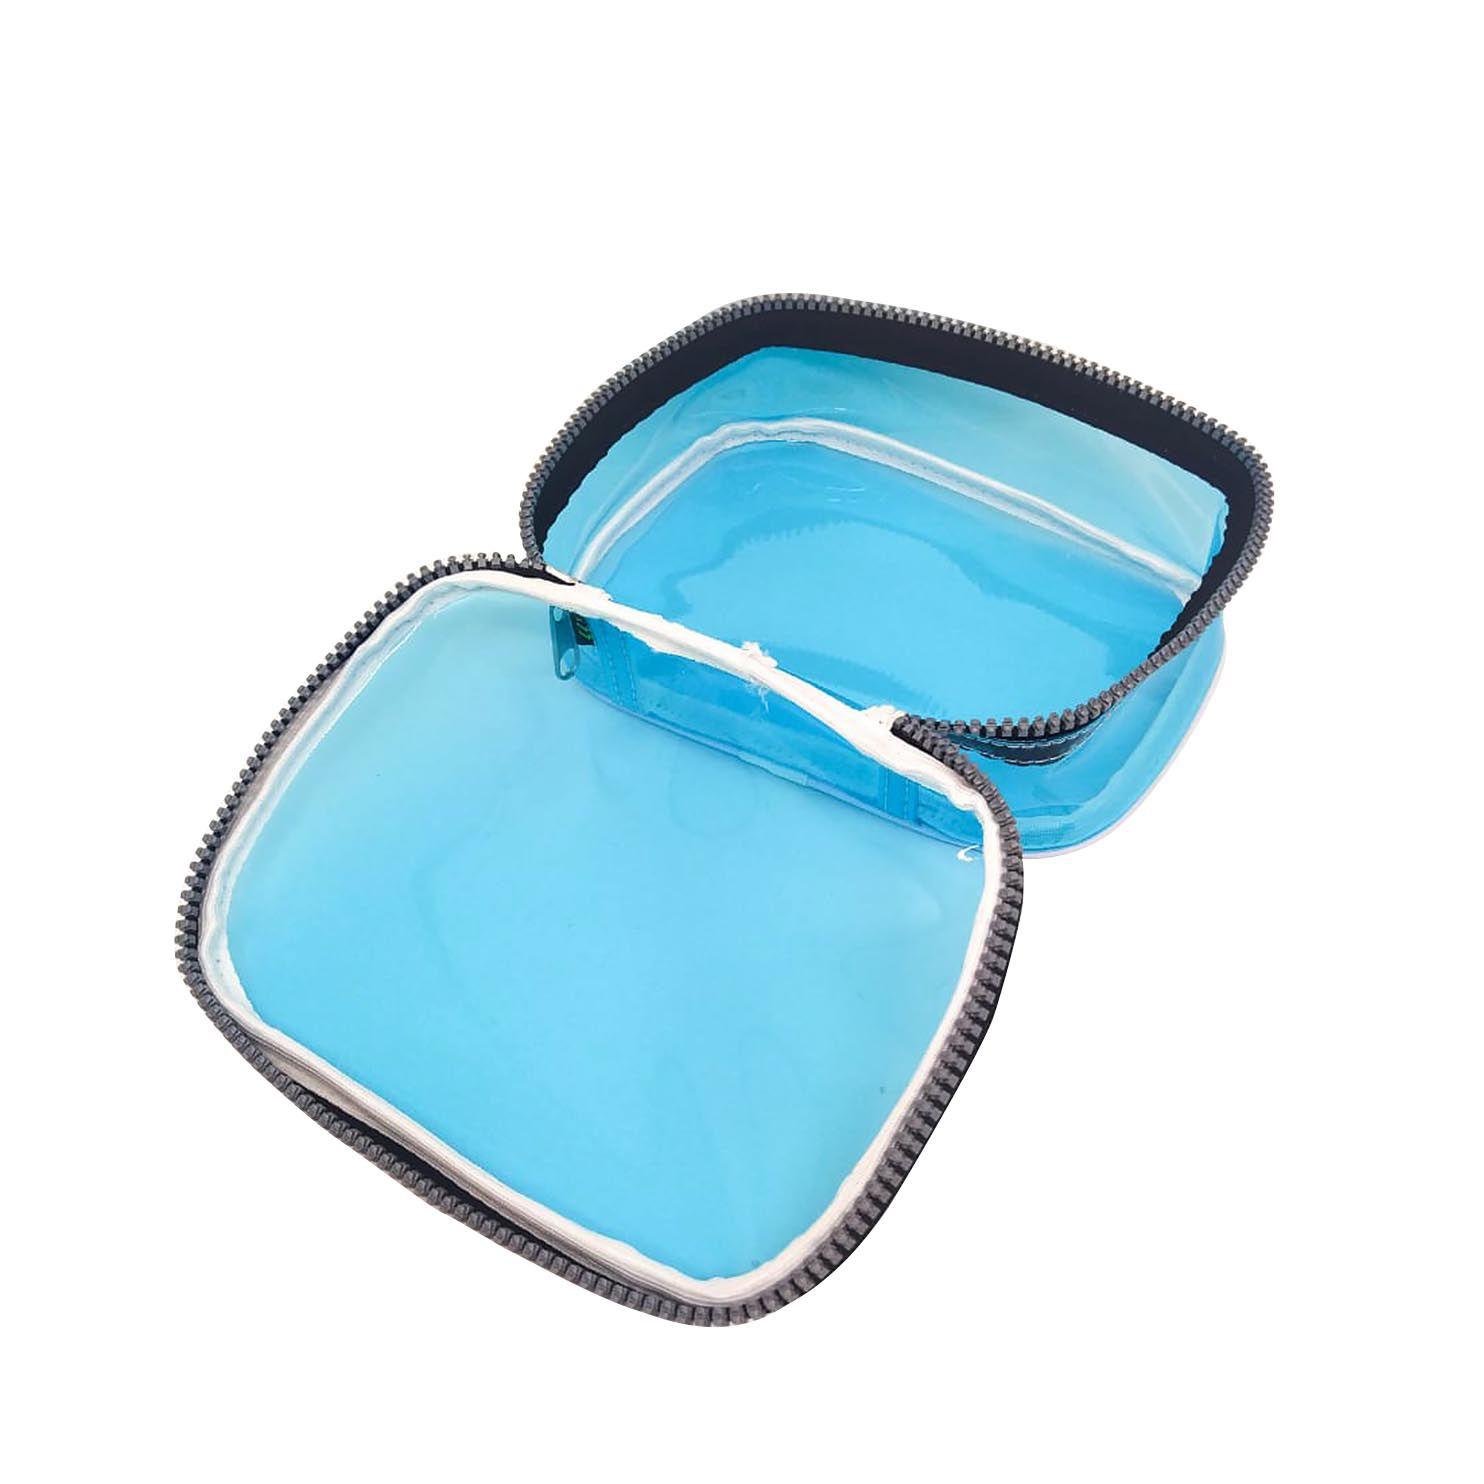 Estojo escolar box azul neon transparente Fizz